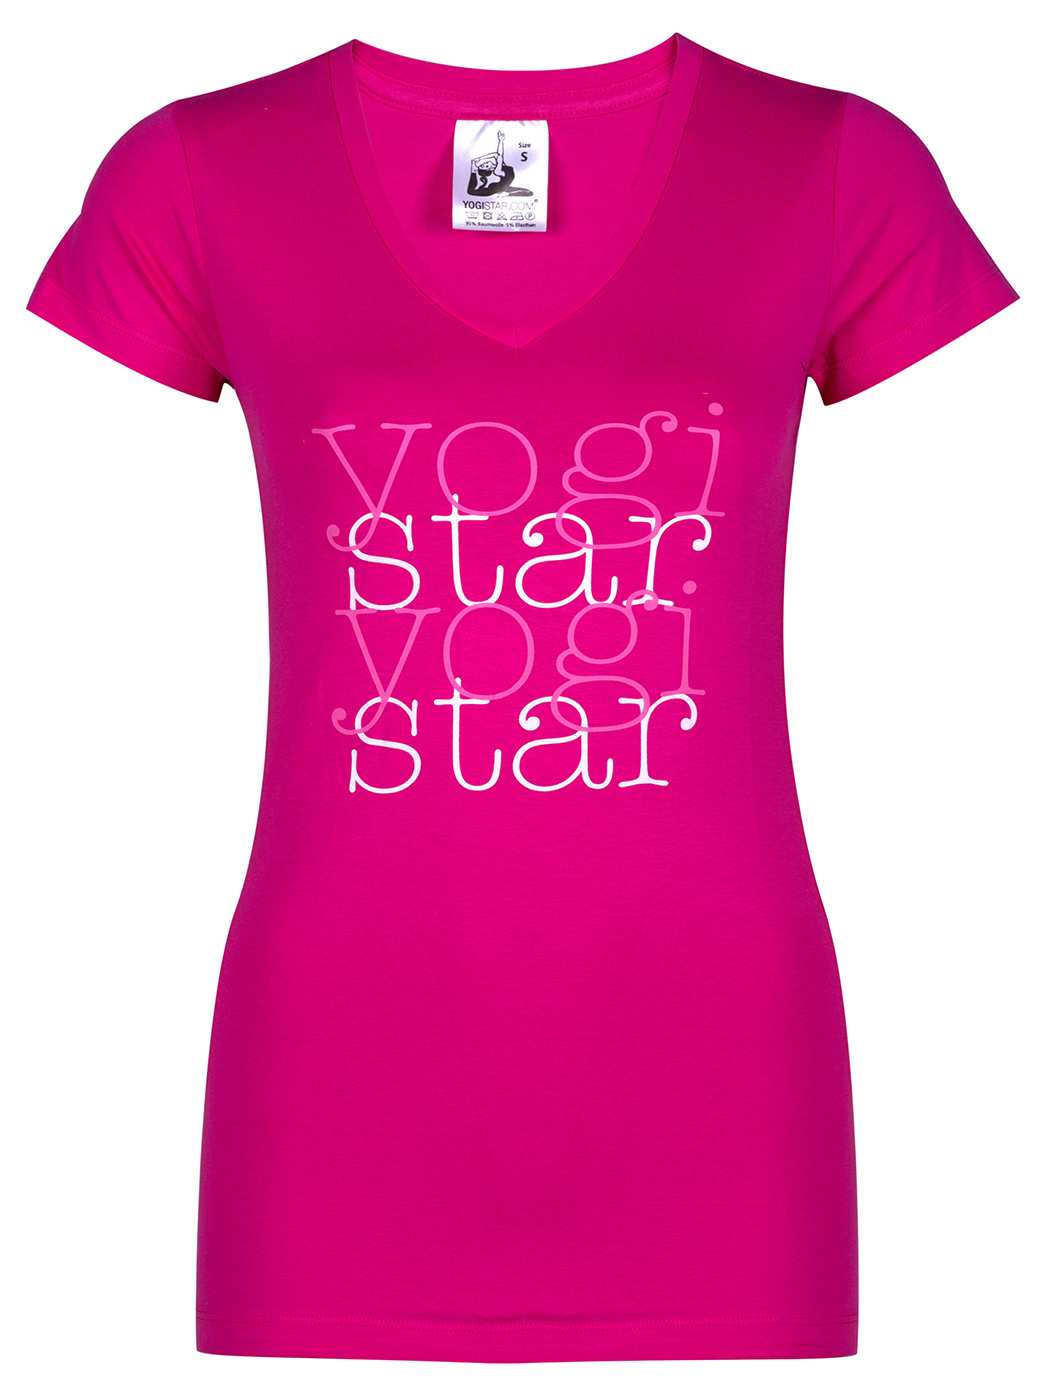 yogi t shirt yogistar pink buy online at yogistar com yoga. Black Bedroom Furniture Sets. Home Design Ideas